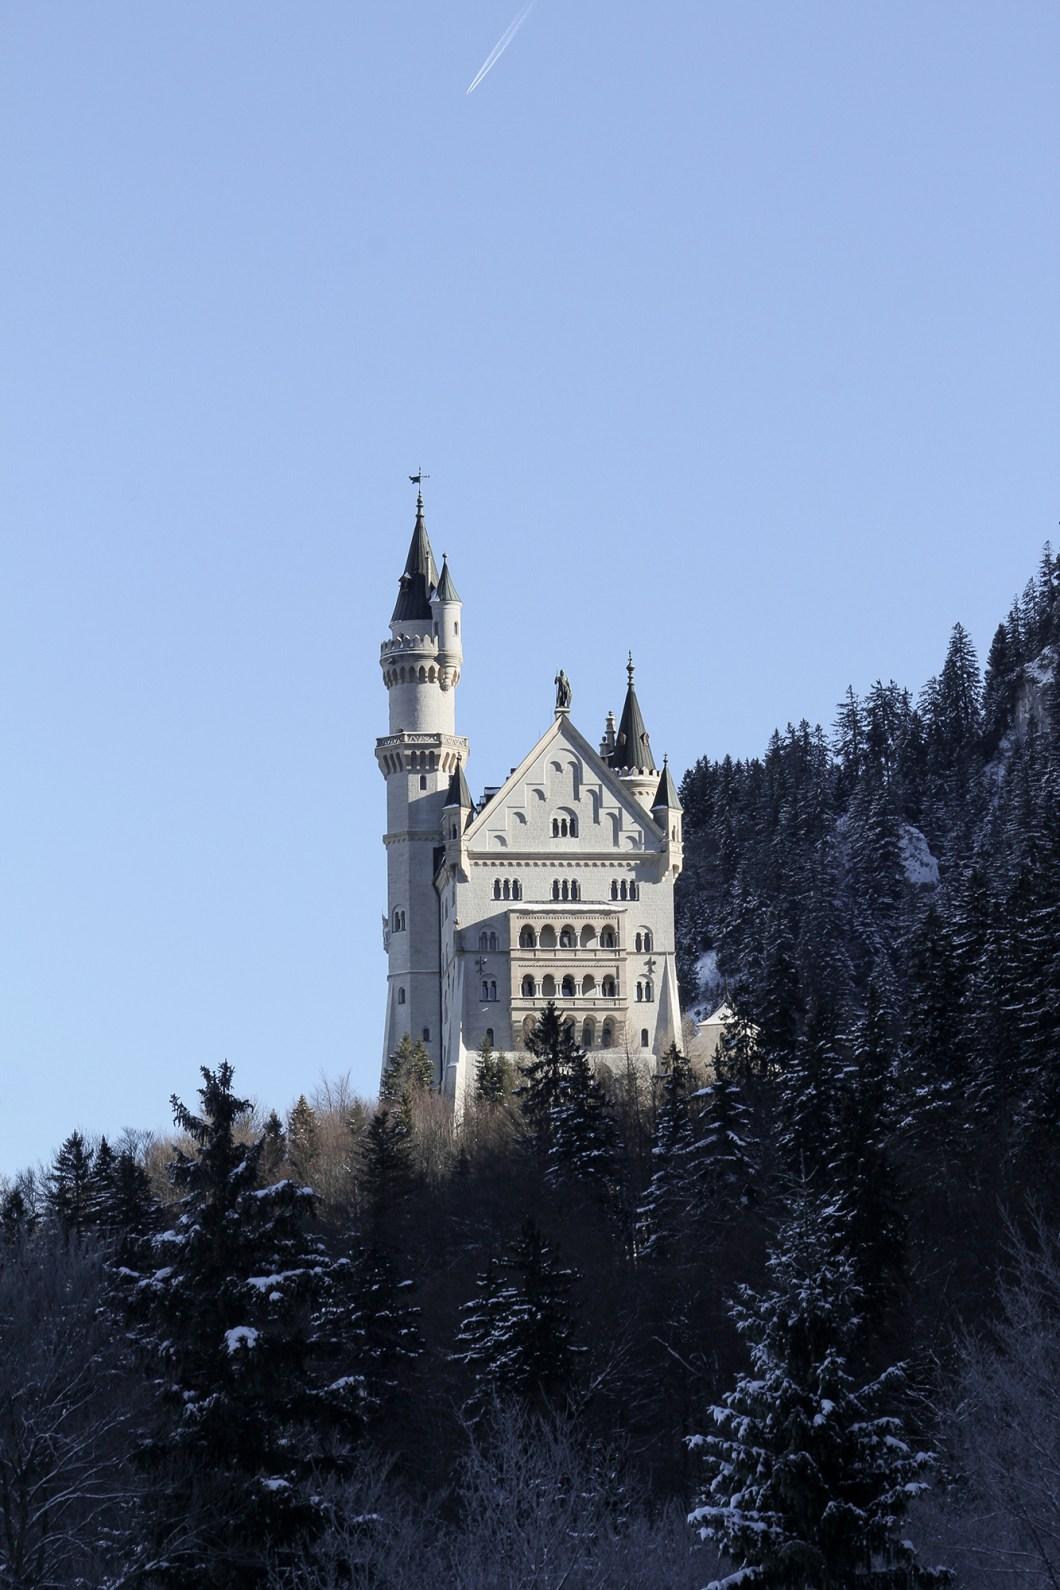 Neuschwanstein Germany | How Far From Home